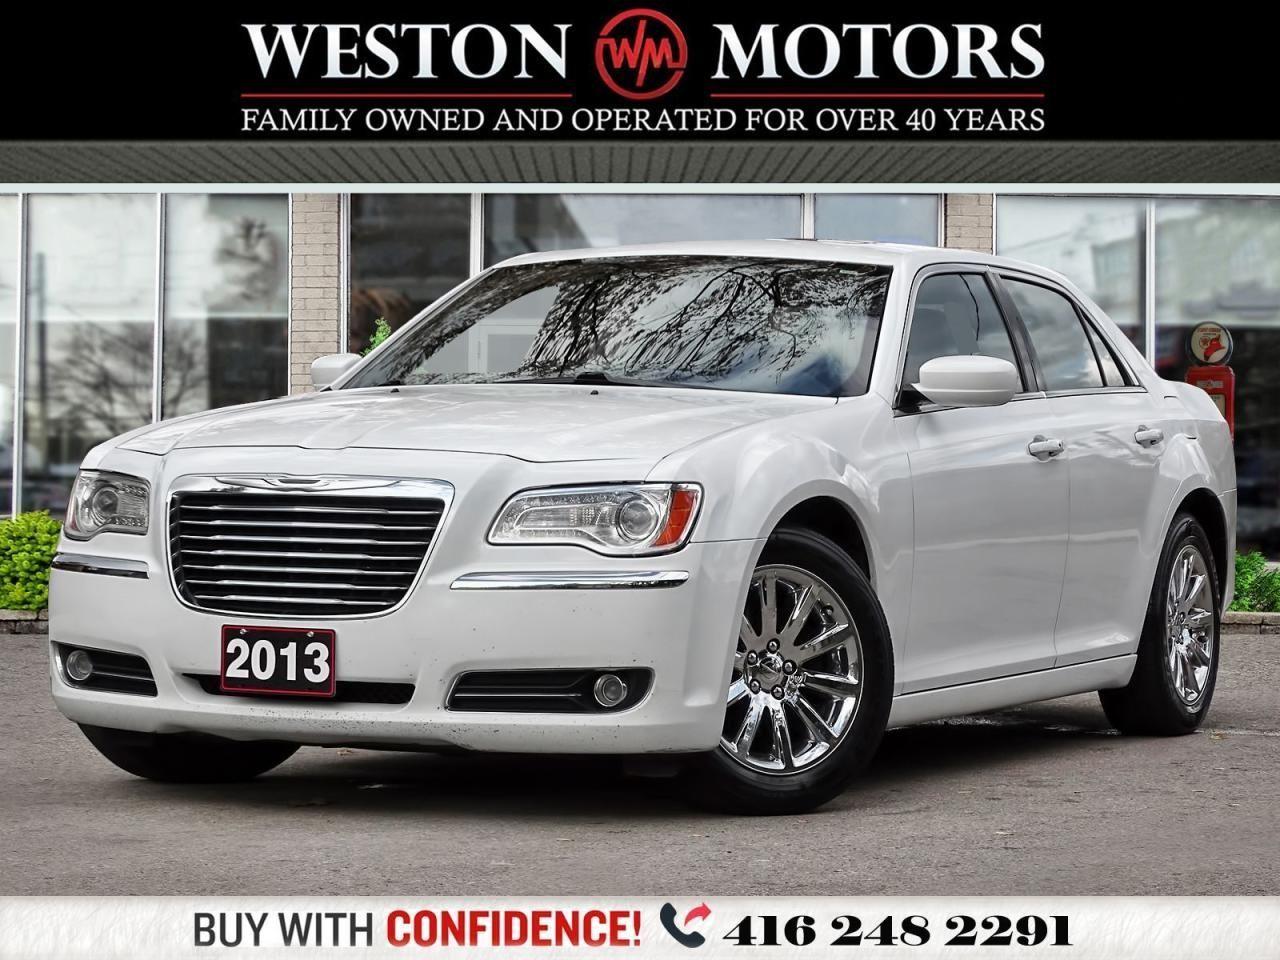 2013 Chrysler 300 LTD*PAN AM SUNROOF*LEATHER*REV CAM!*